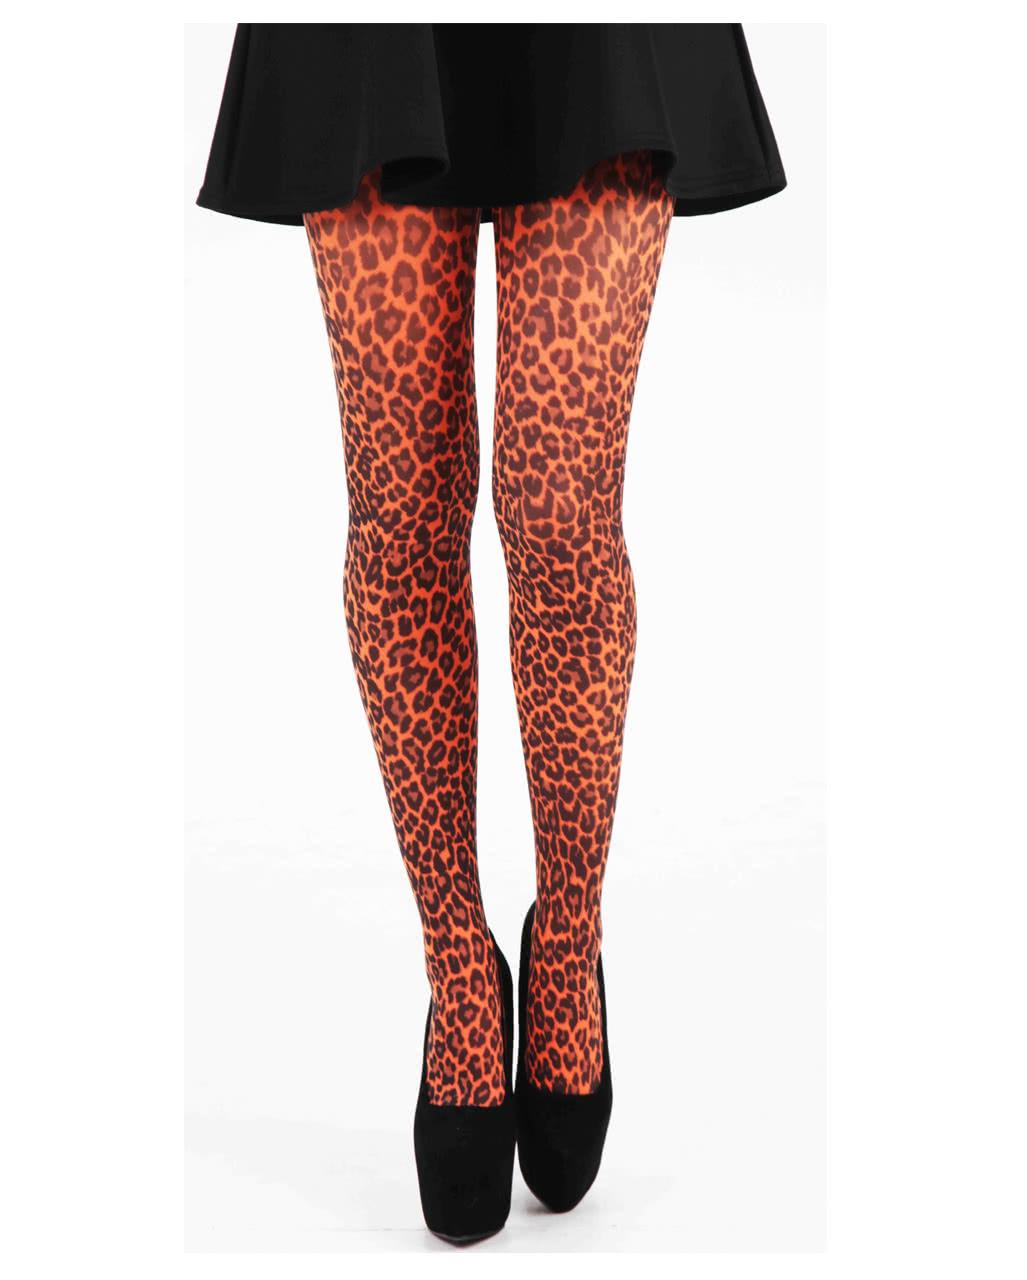 9e3728c75d8b Leopard print tights | Fashion Accessories | horror-shop.com